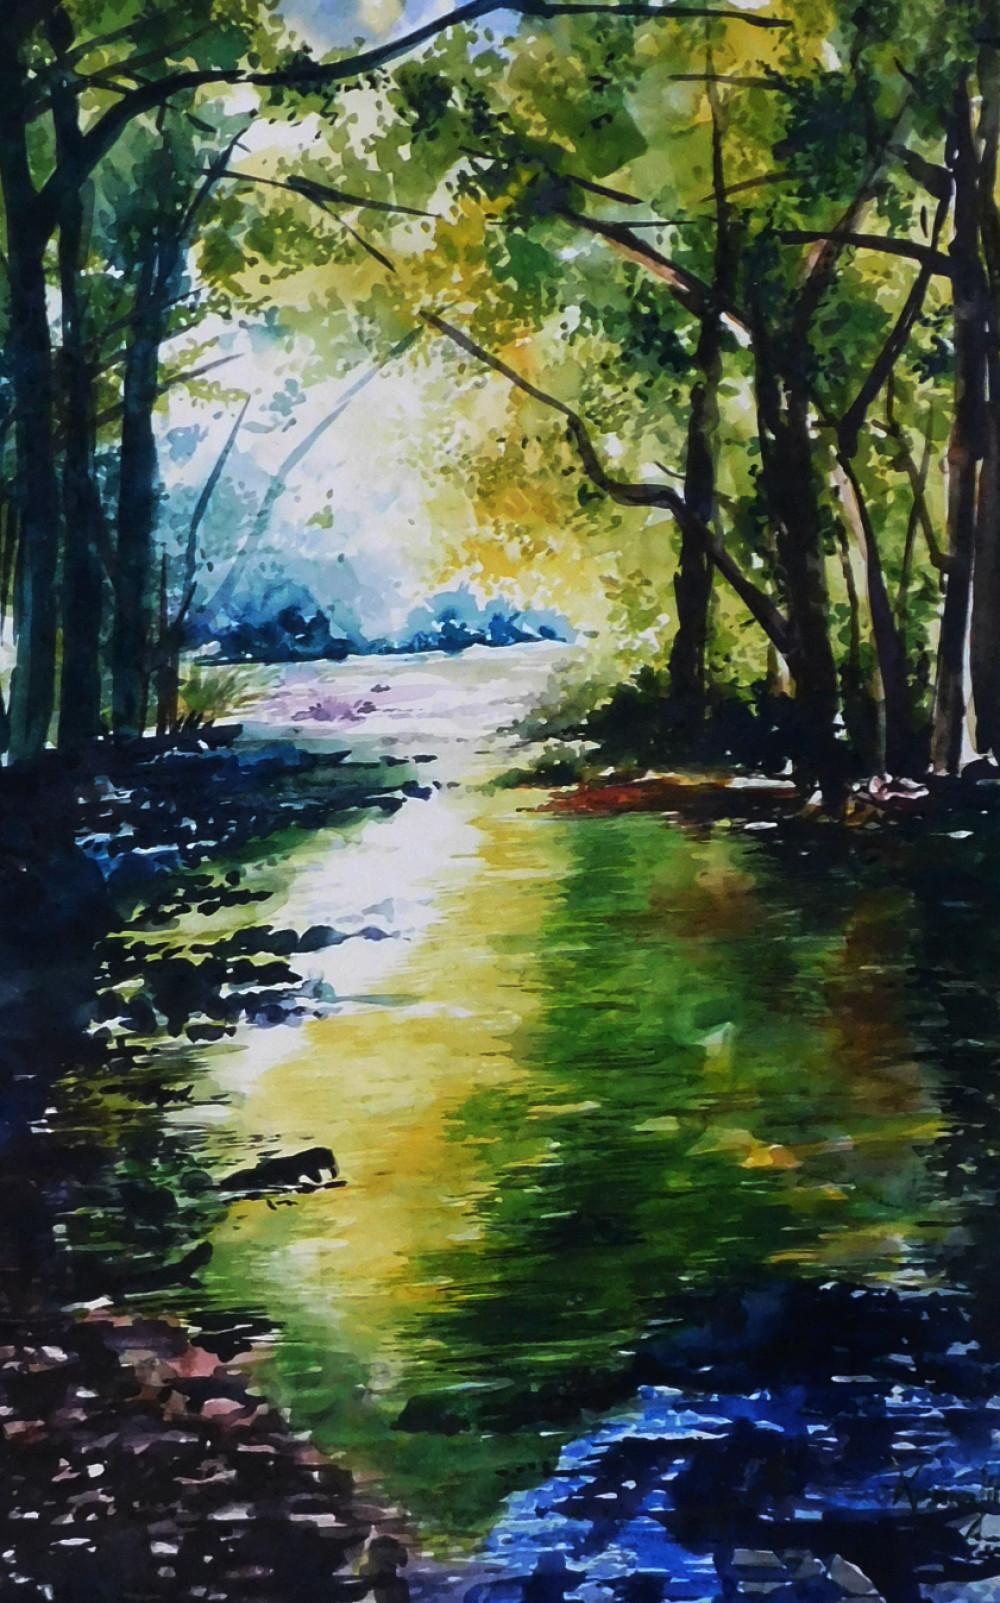 Landscape Painting Images  Landscape Painting by Pabitra Dutta